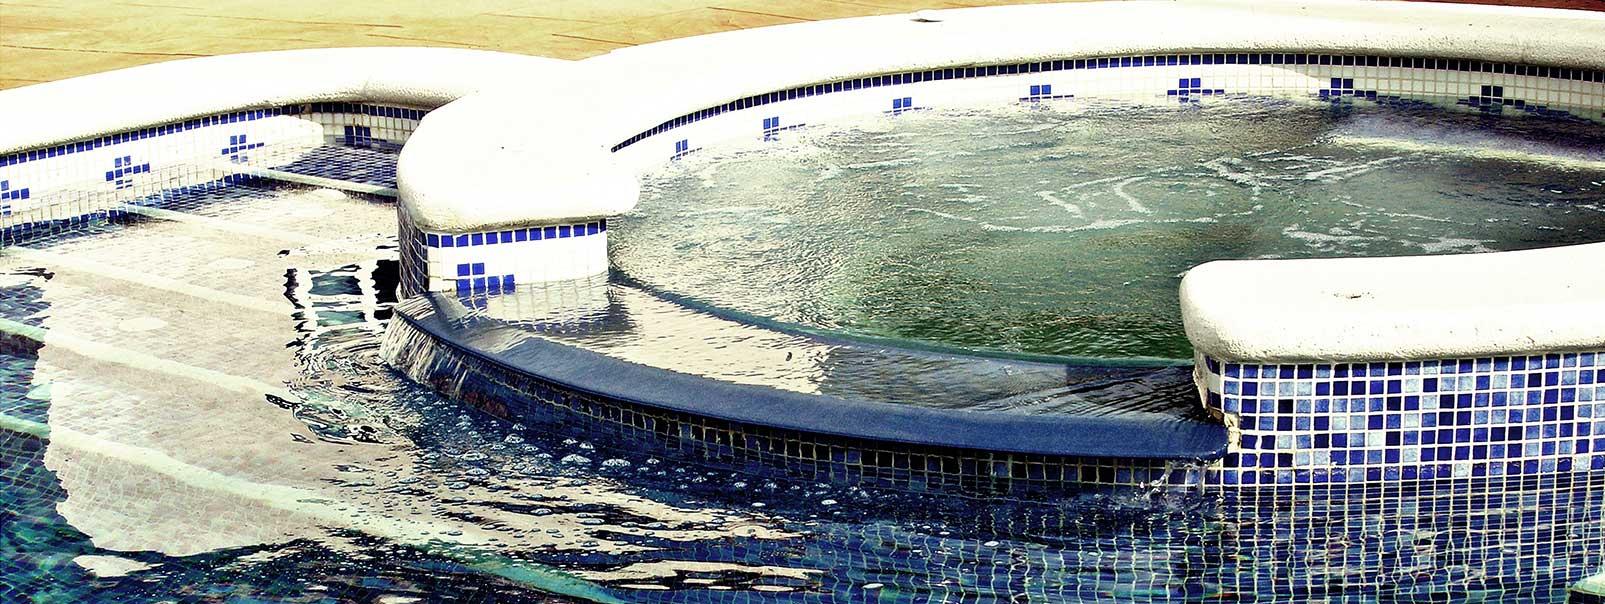 aguaviva-piscina-sli-03